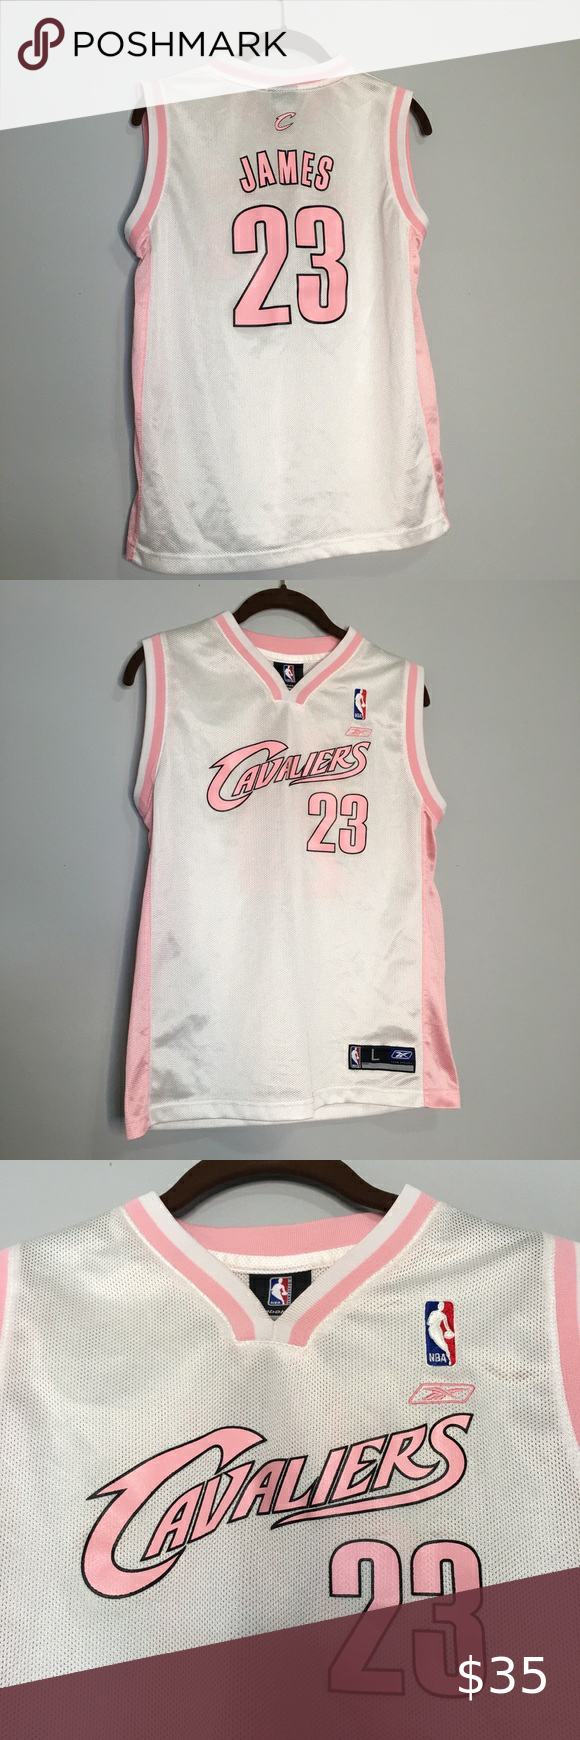 james pink jersey